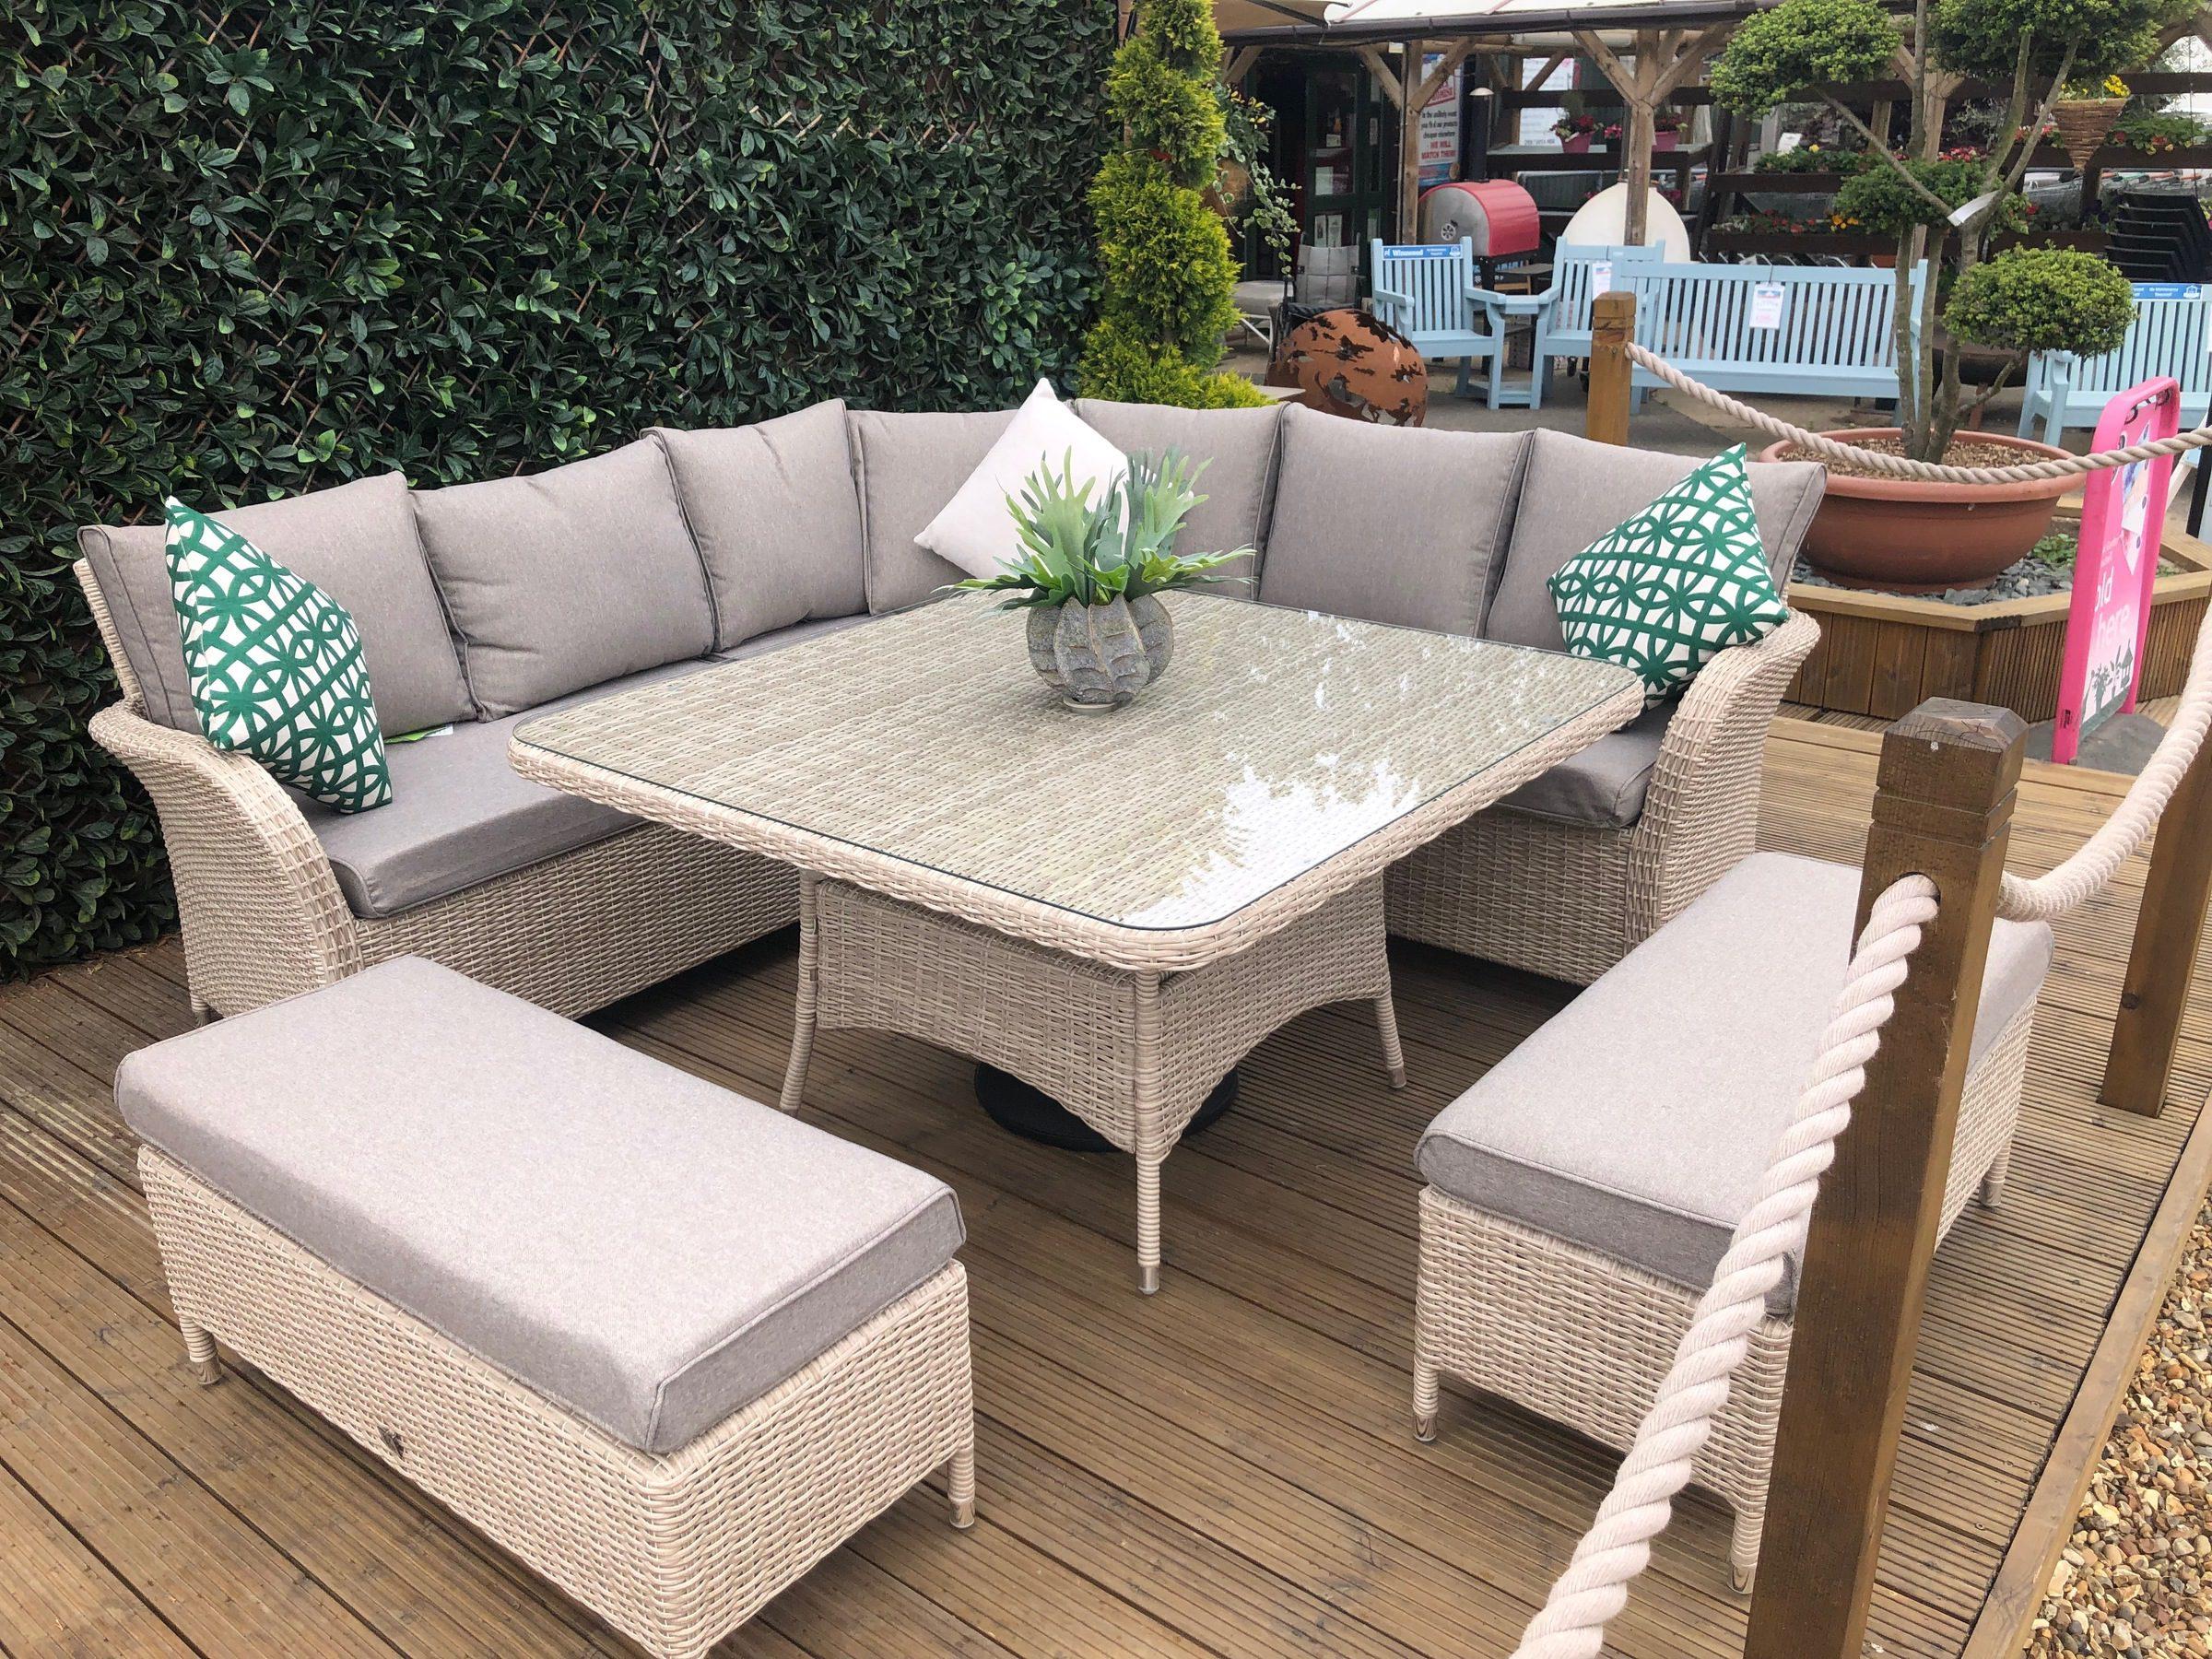 LeisureGrow Monaco Large Square Table Dining Set